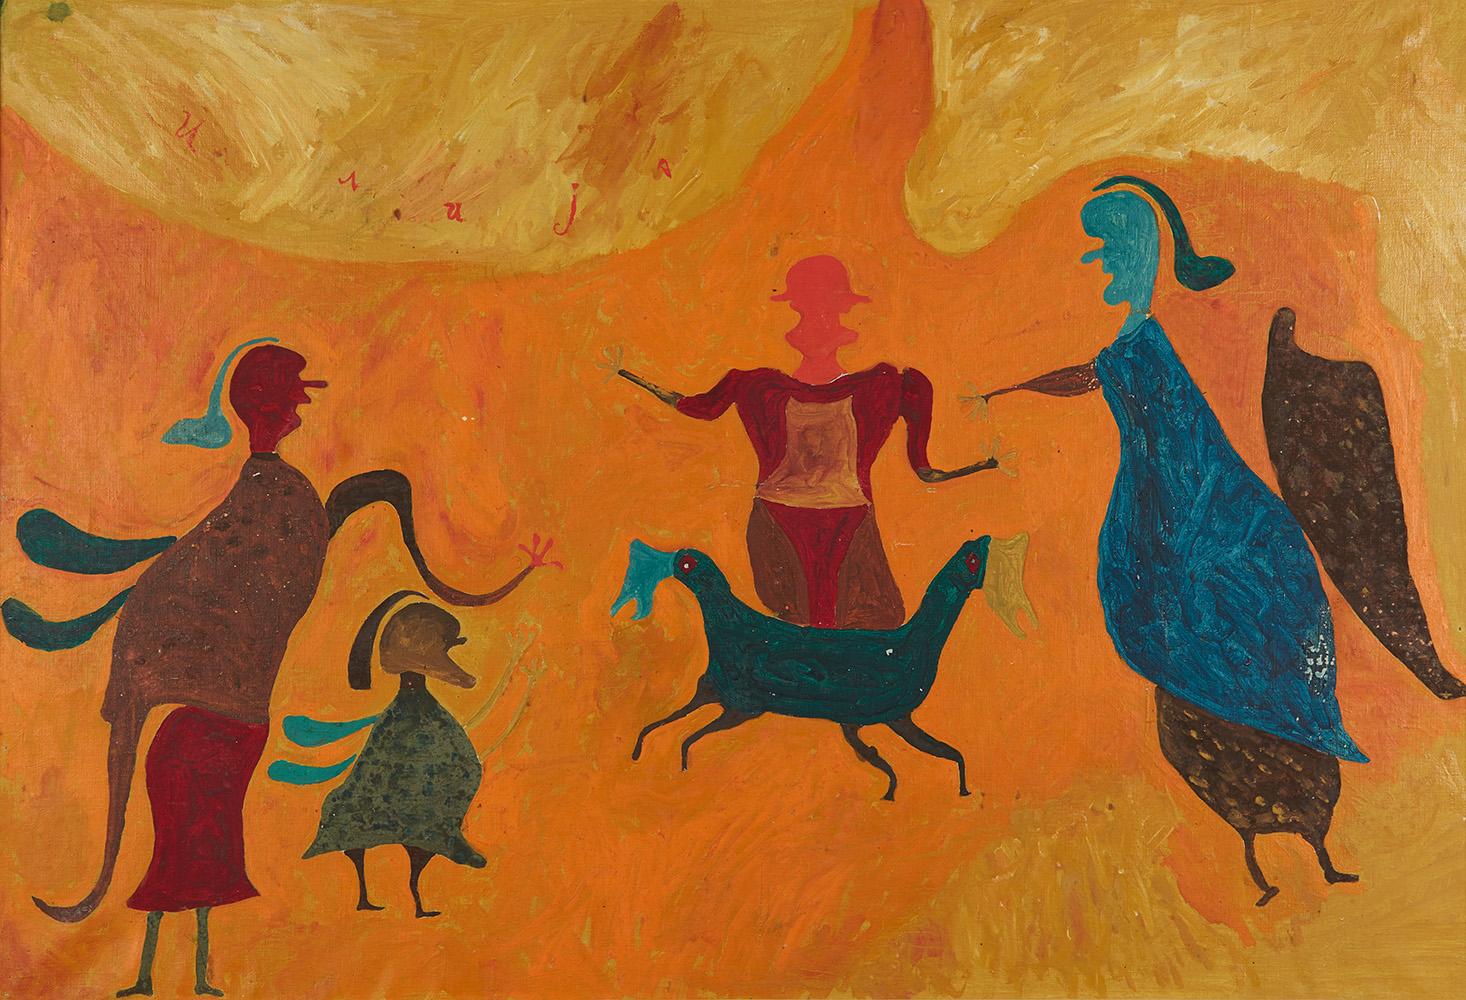 Ilija Bosilj Bašičević    Welcoming The Two Faced Rider  , 1963 Oil on canvas 26.5 x 39.5 inches 67.3 x 100.3 cm IBo 6